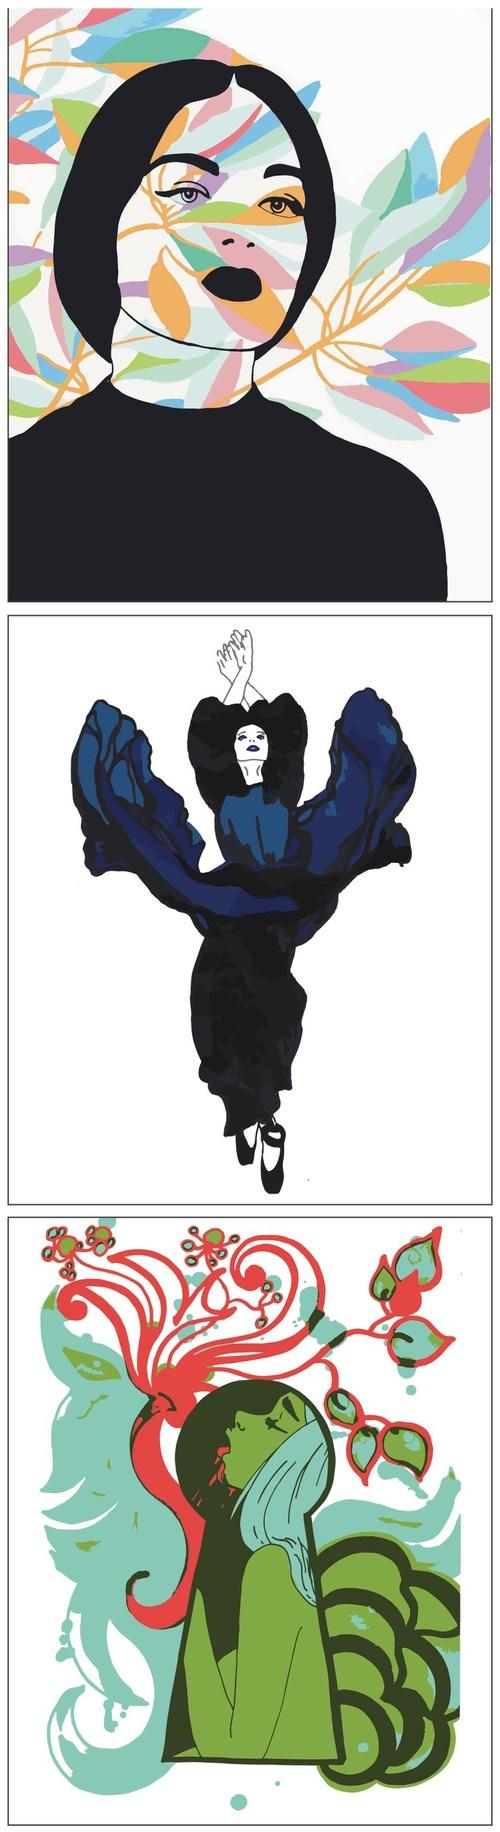 Artist, Kristin Burnett - Atmospheric, Black to Blue, Quaaludes - Ink on vellum / Digital print on canvas - 16 in x 20 in (40.64cm x 50.8cm) - $120.00 ea. @ BLICK Art Materials, Beaverton, OR